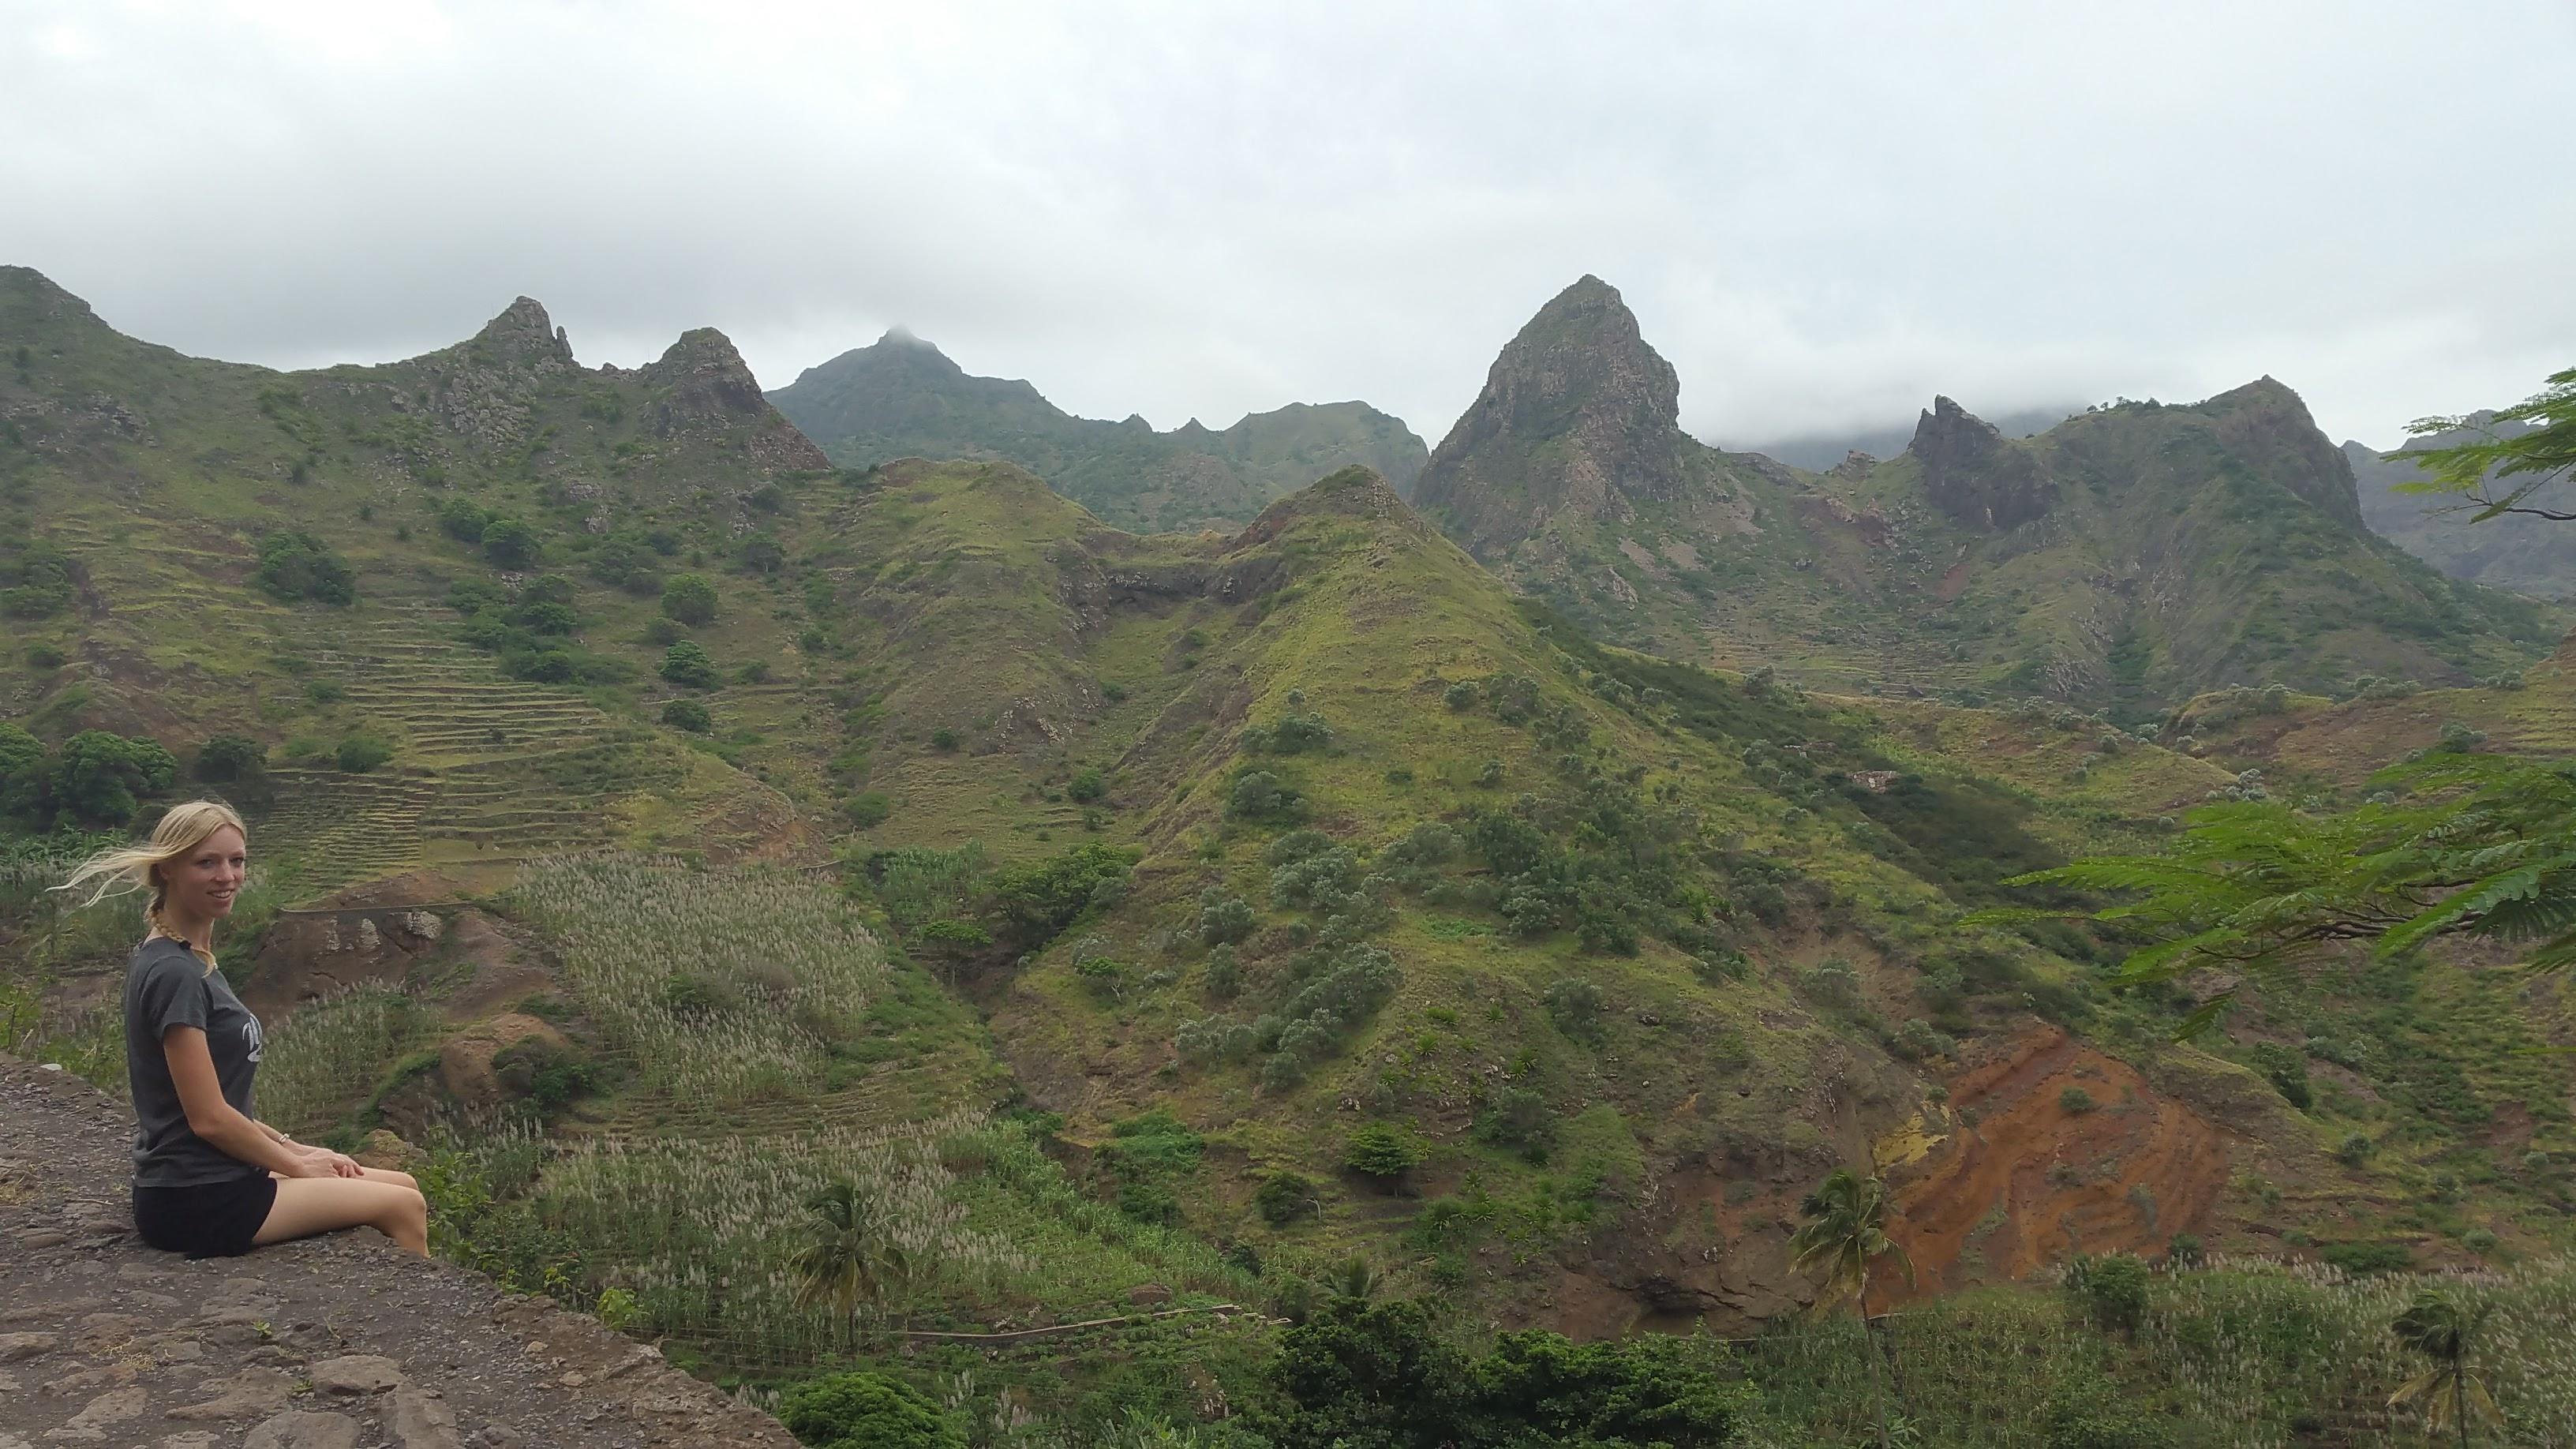 Ecotourism in Cape Verde